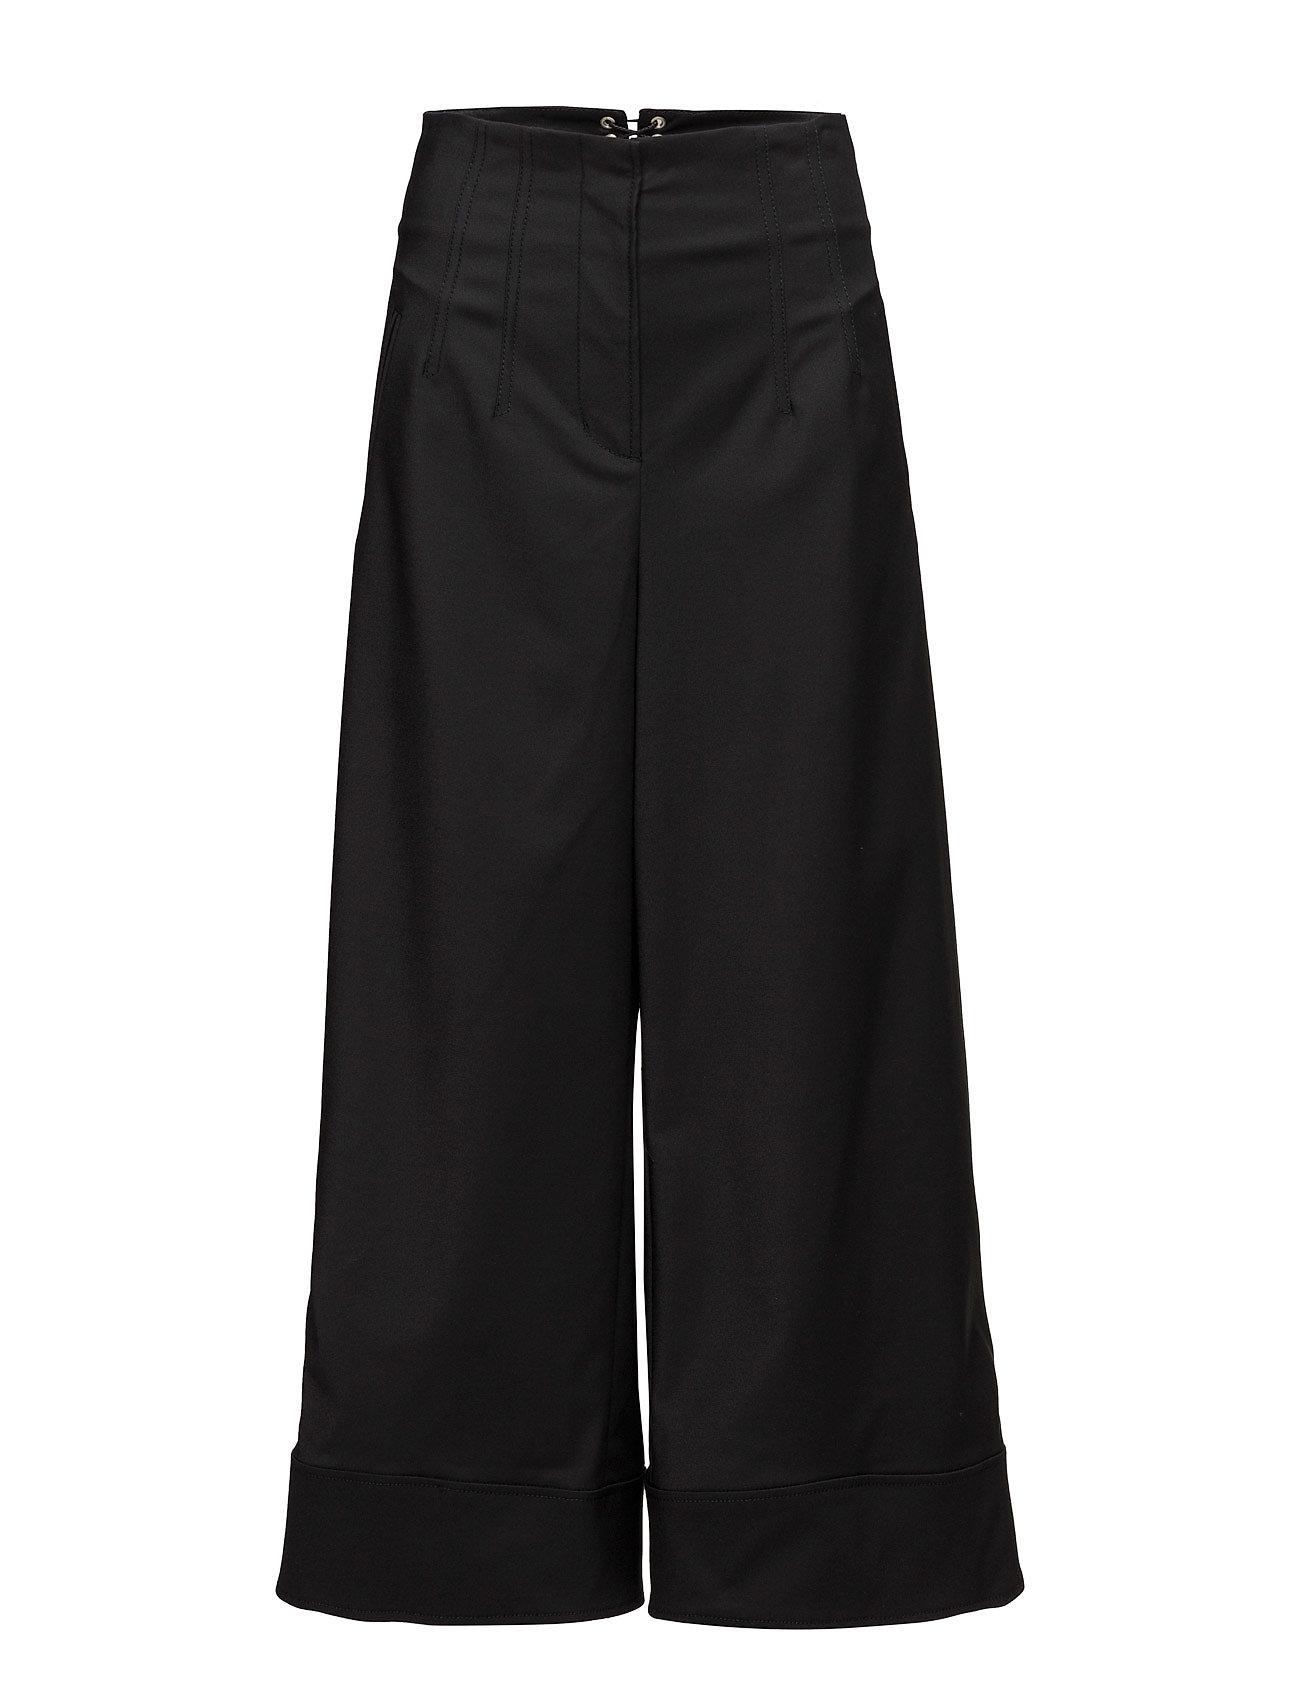 3.1 phillip lim – Sailor wide leg pant - cnt på boozt.com dk